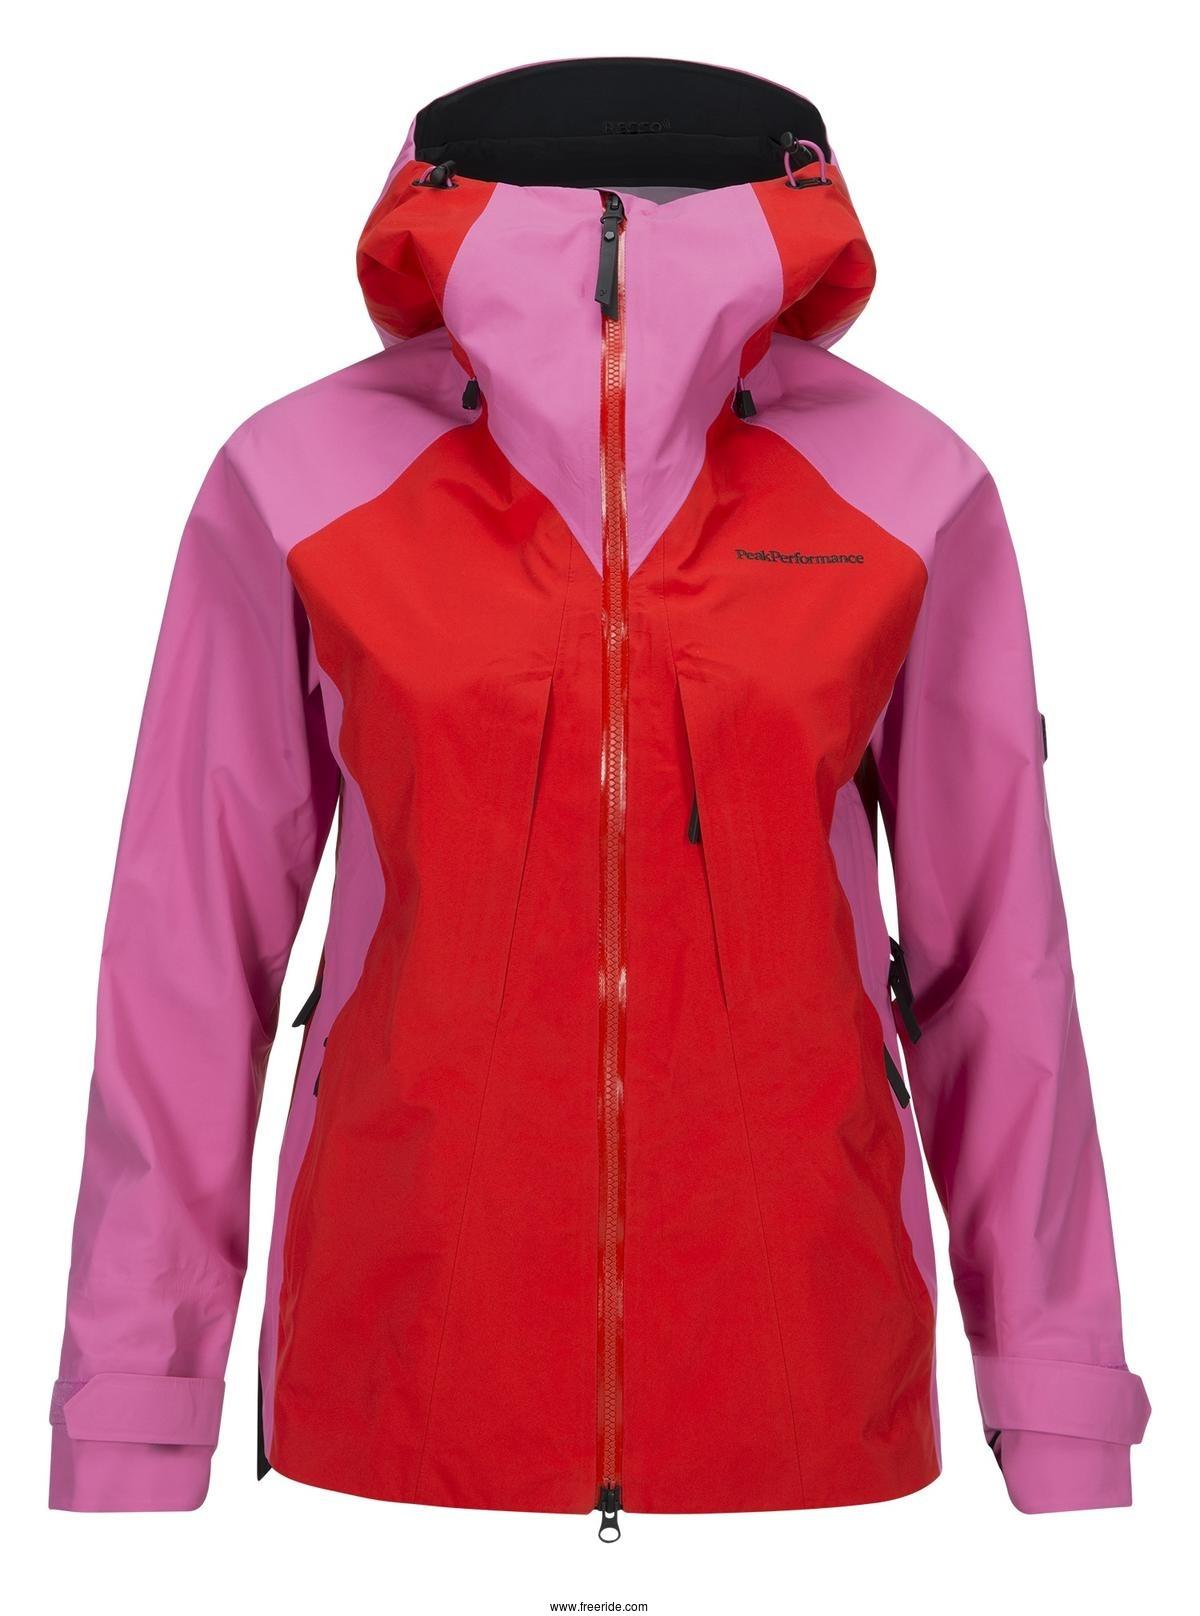 new style c7b6e 1db60 Peak Performance Womens Teton Ski Jacket review - Freeride